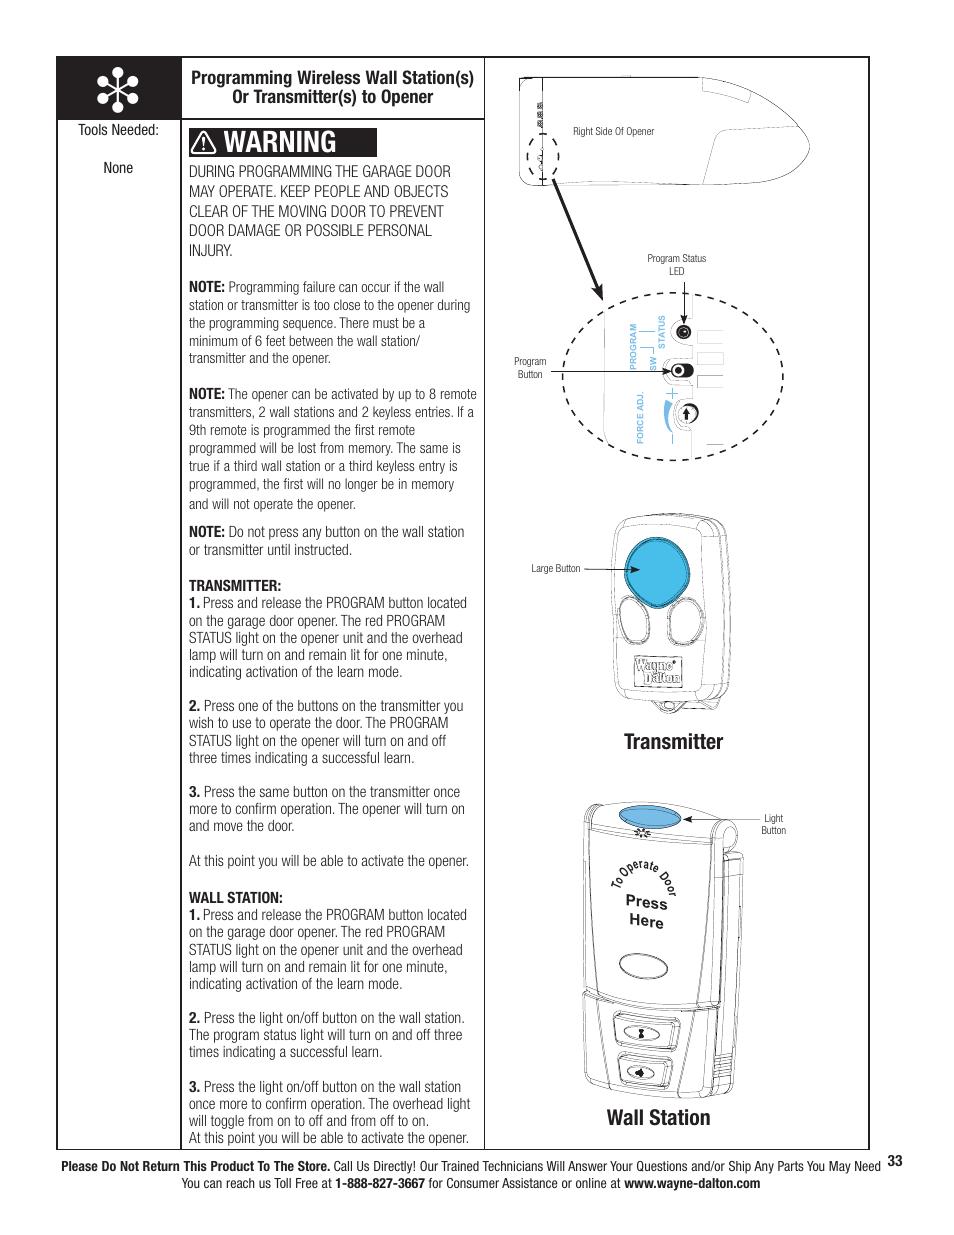 wayne dalton garage door wiring diagram trusted wiring diagrams u2022 rh weneedradio org Chamberlain Whisper Drive Garage Door Opener Wiring-Diagram Chamberlain Whisper Drive Garage Door Opener Wiring-Diagram